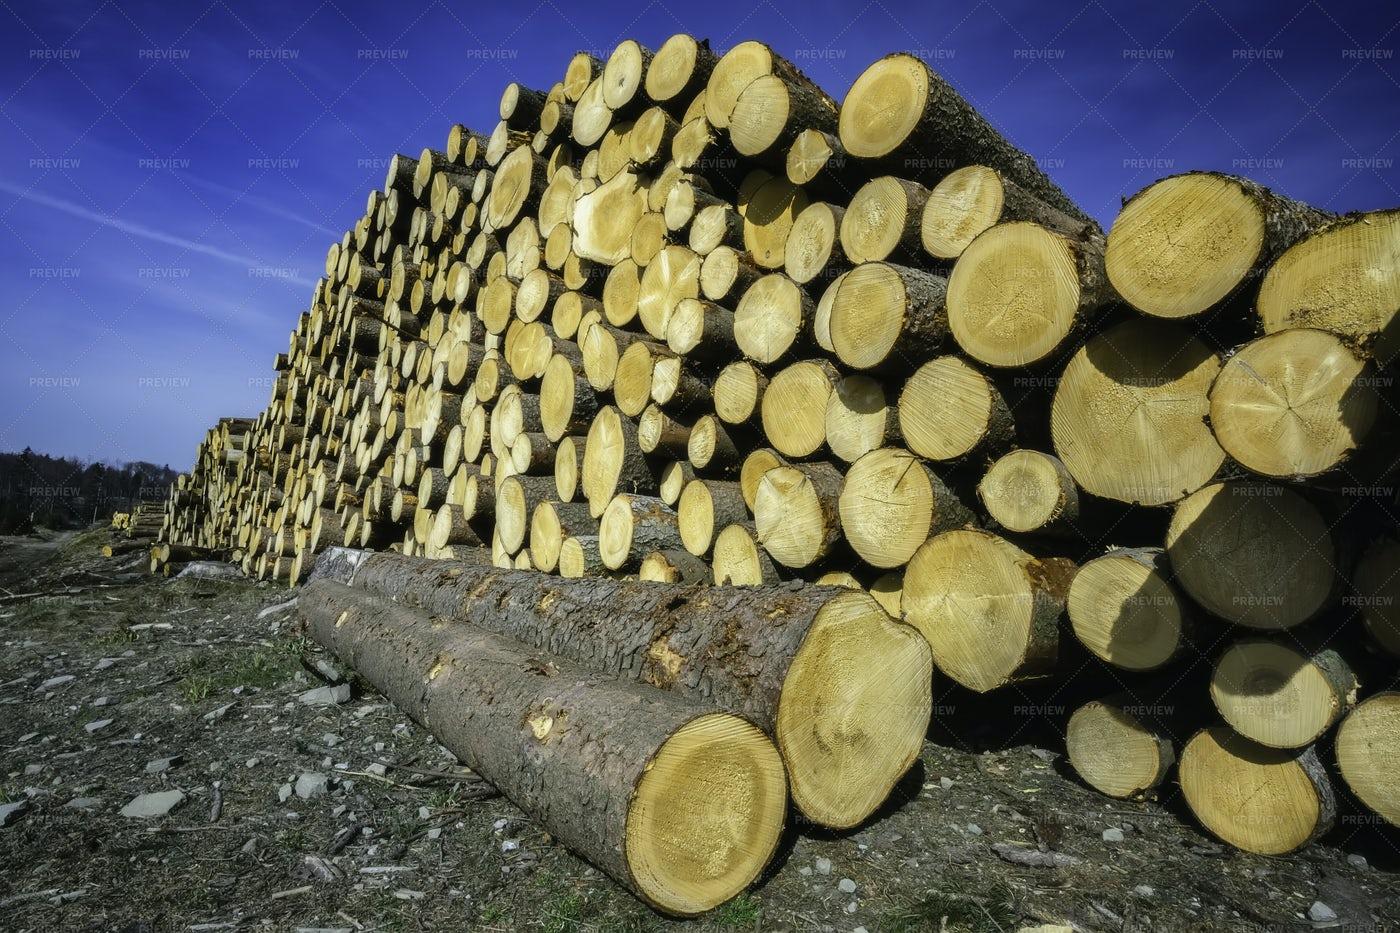 Pile Of Cut Tree Trunks: Stock Photos